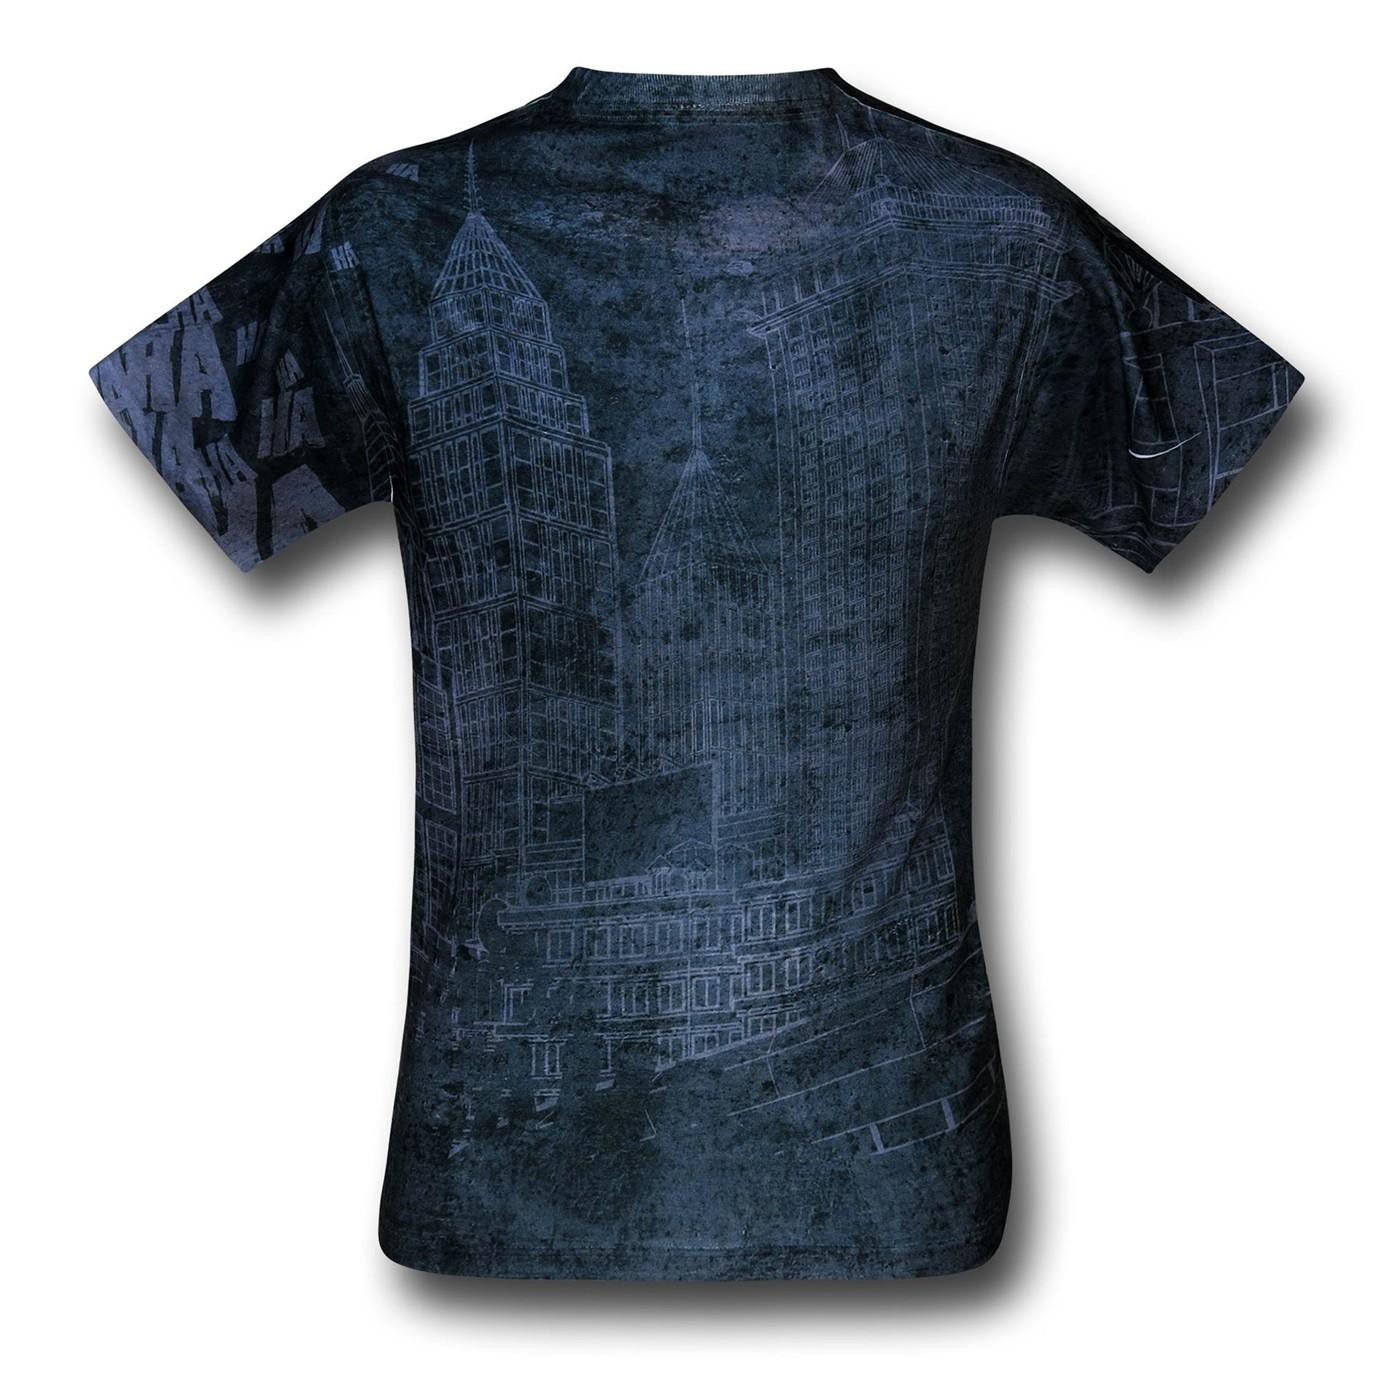 Joker Sprays the City Sublimated T-Shirt